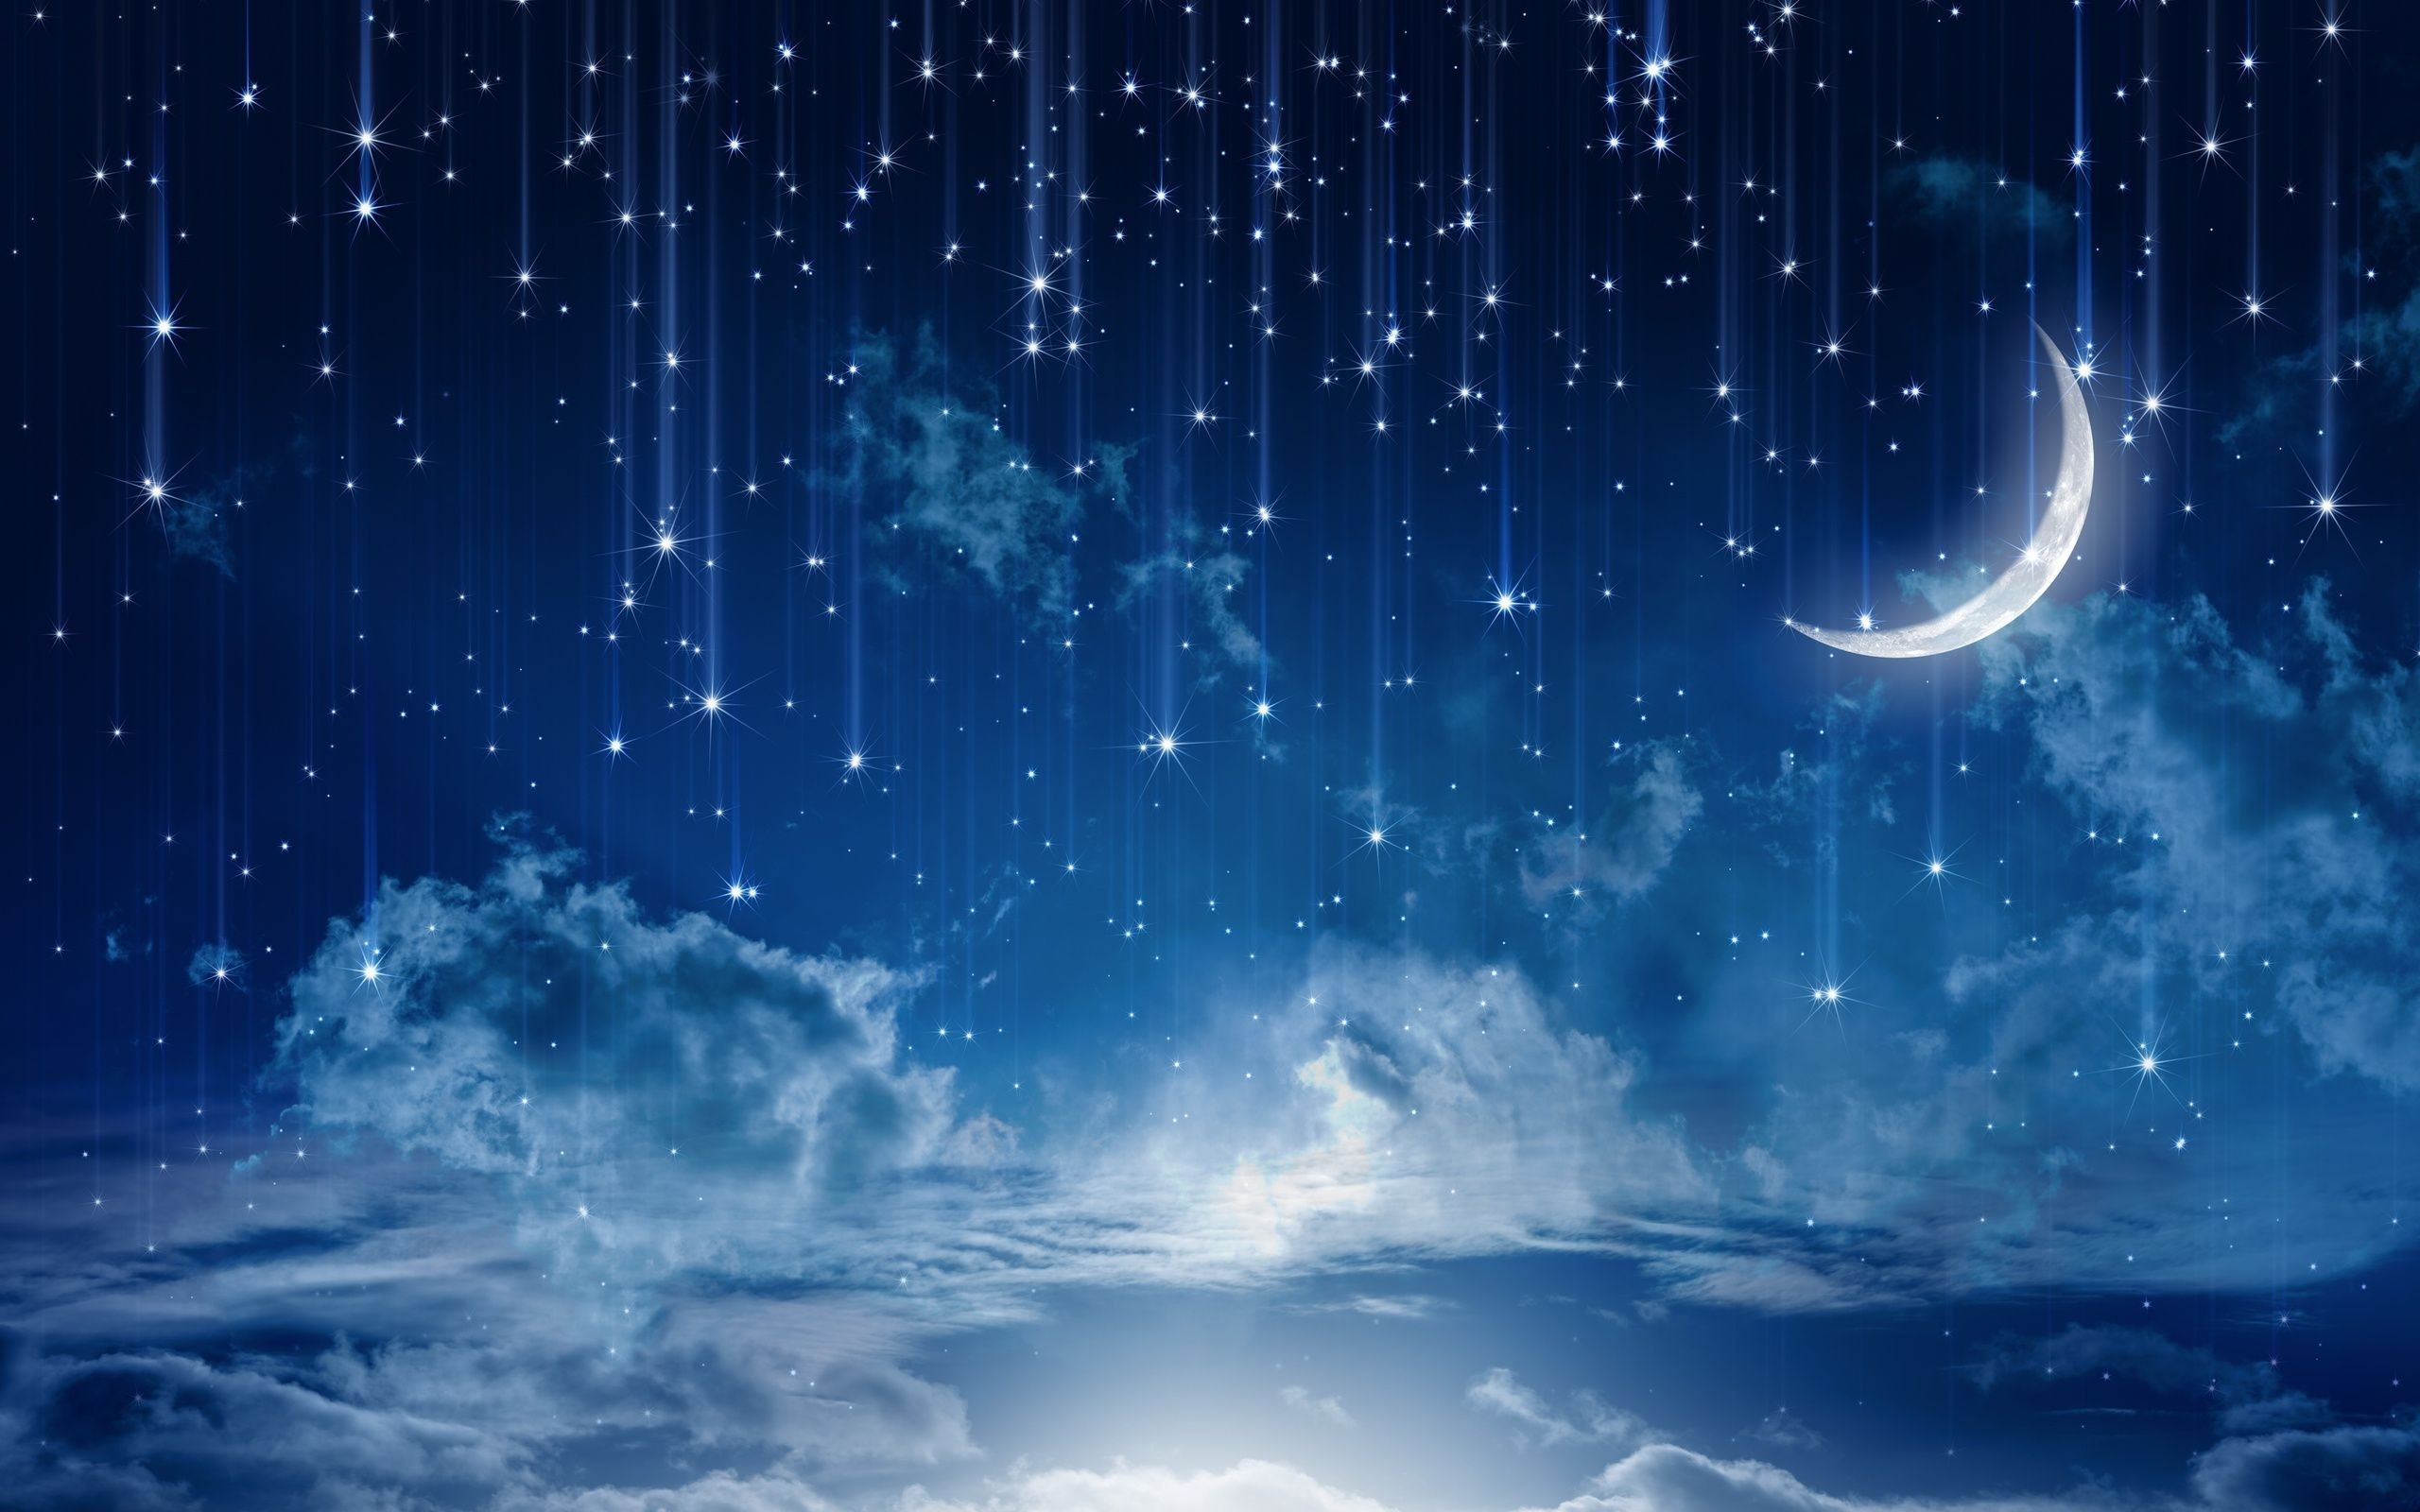 Shooting Stars Wallpaper 76 images 2560x1600